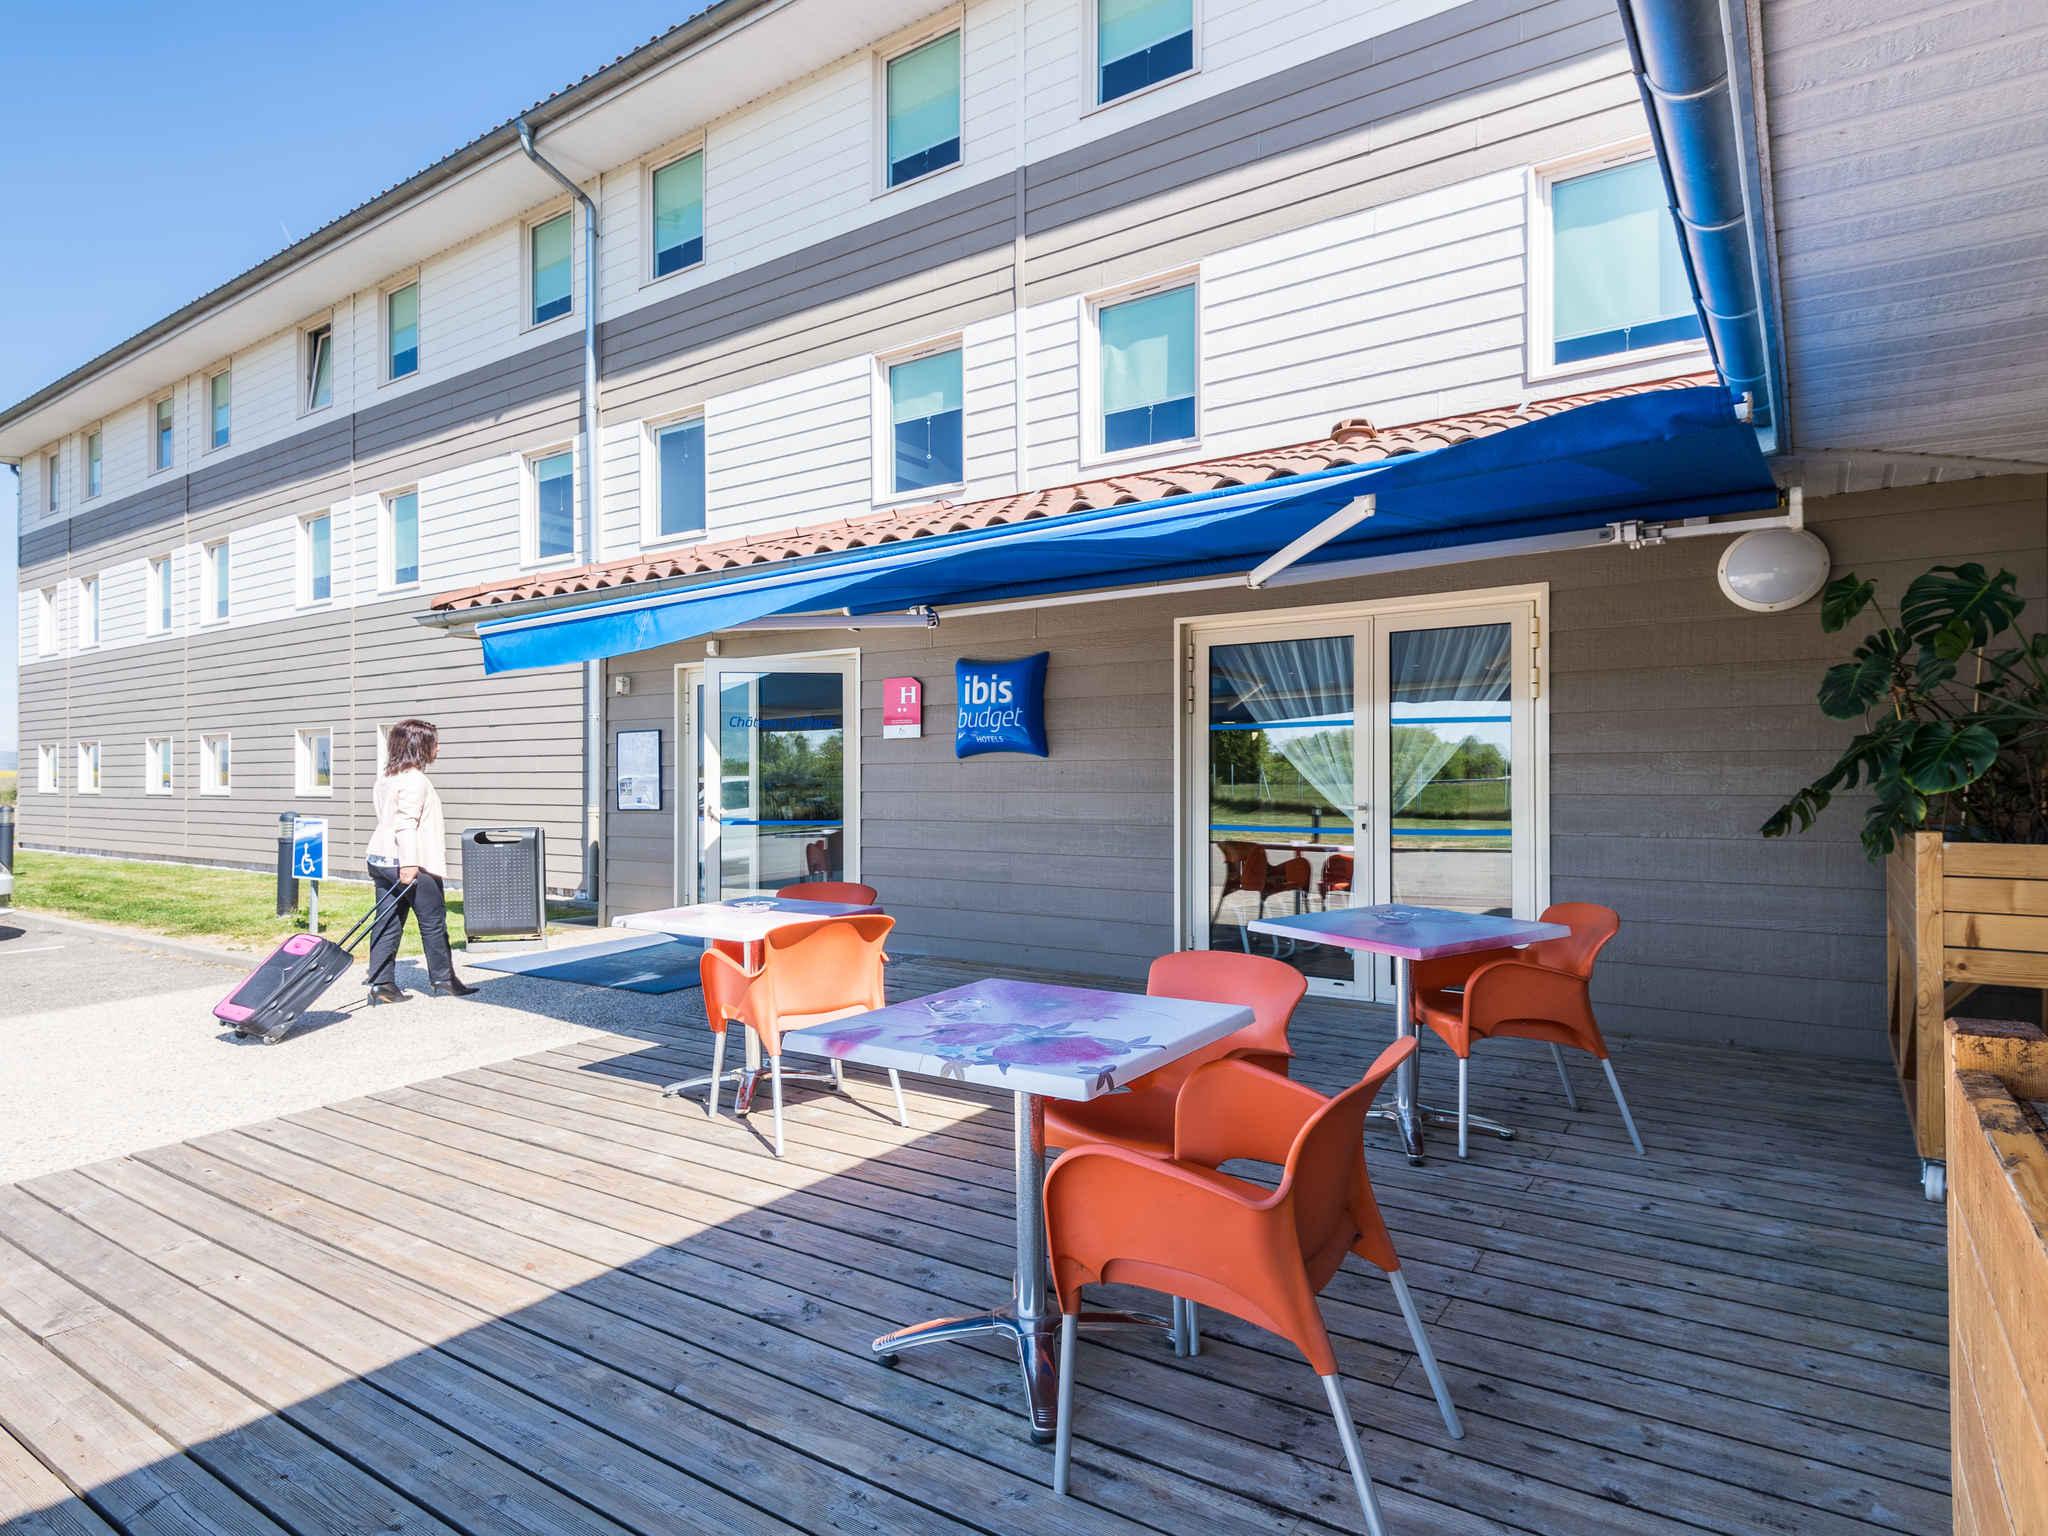 Hotel – IBIS BUDGET AMBERIEU EN BUGEY CHATEAU GAILLARD